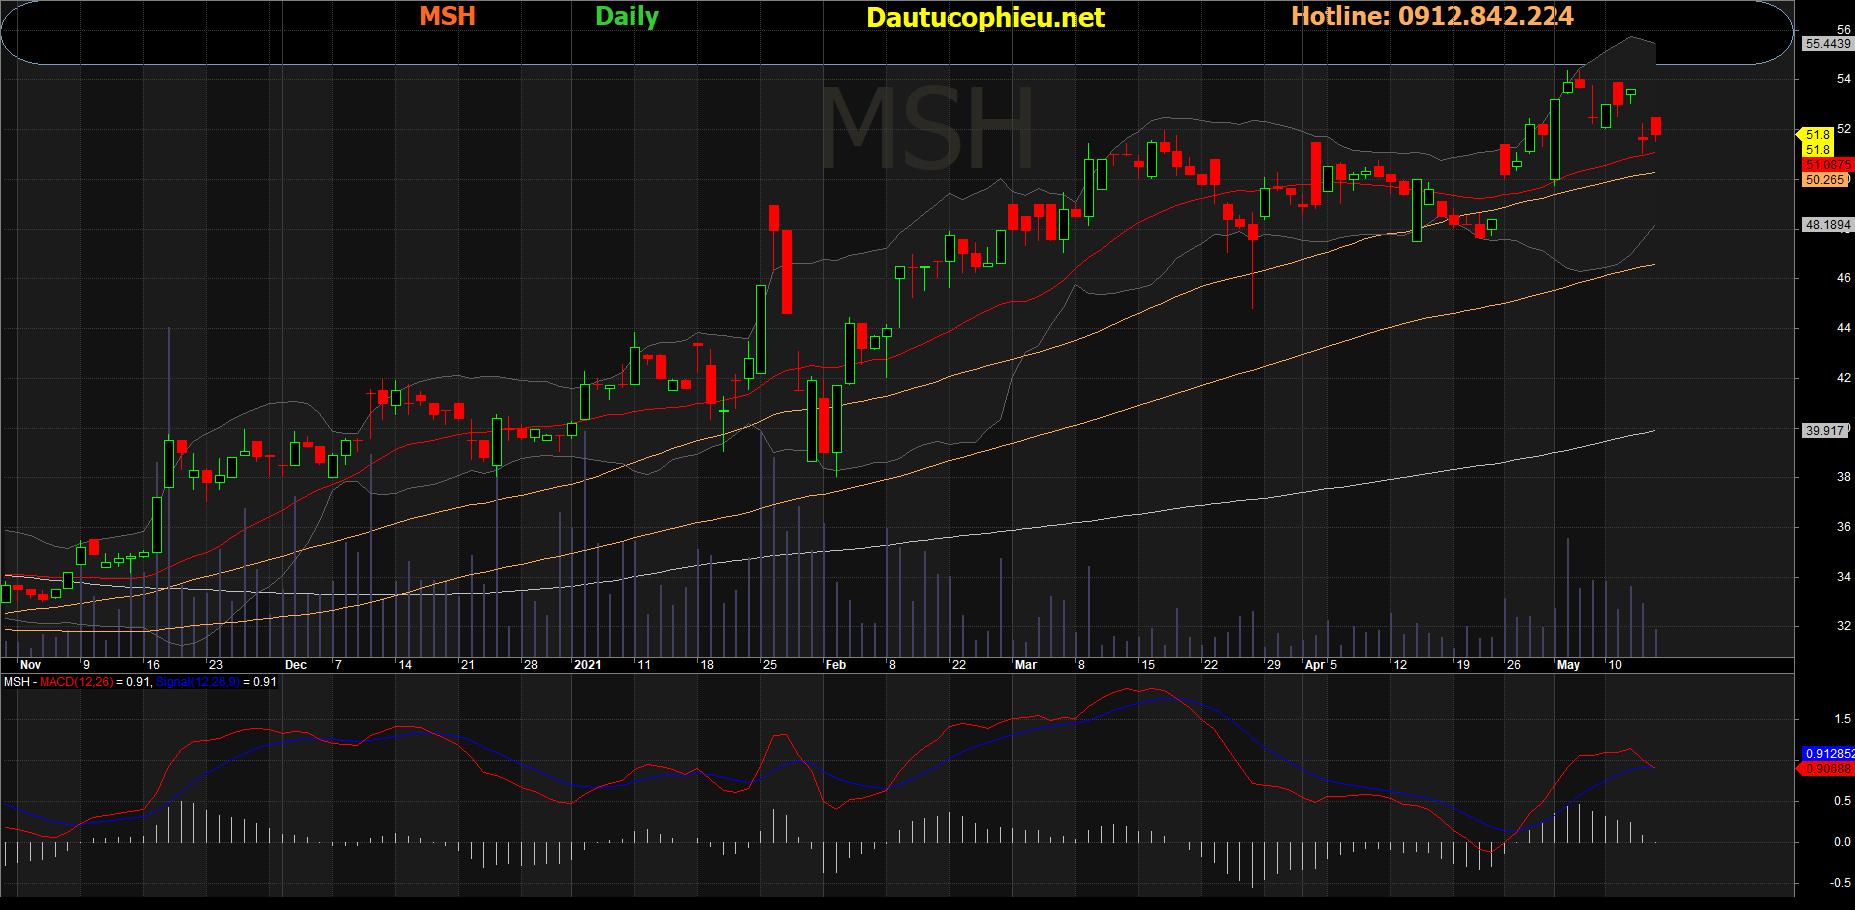 Cổ phiếu MSH